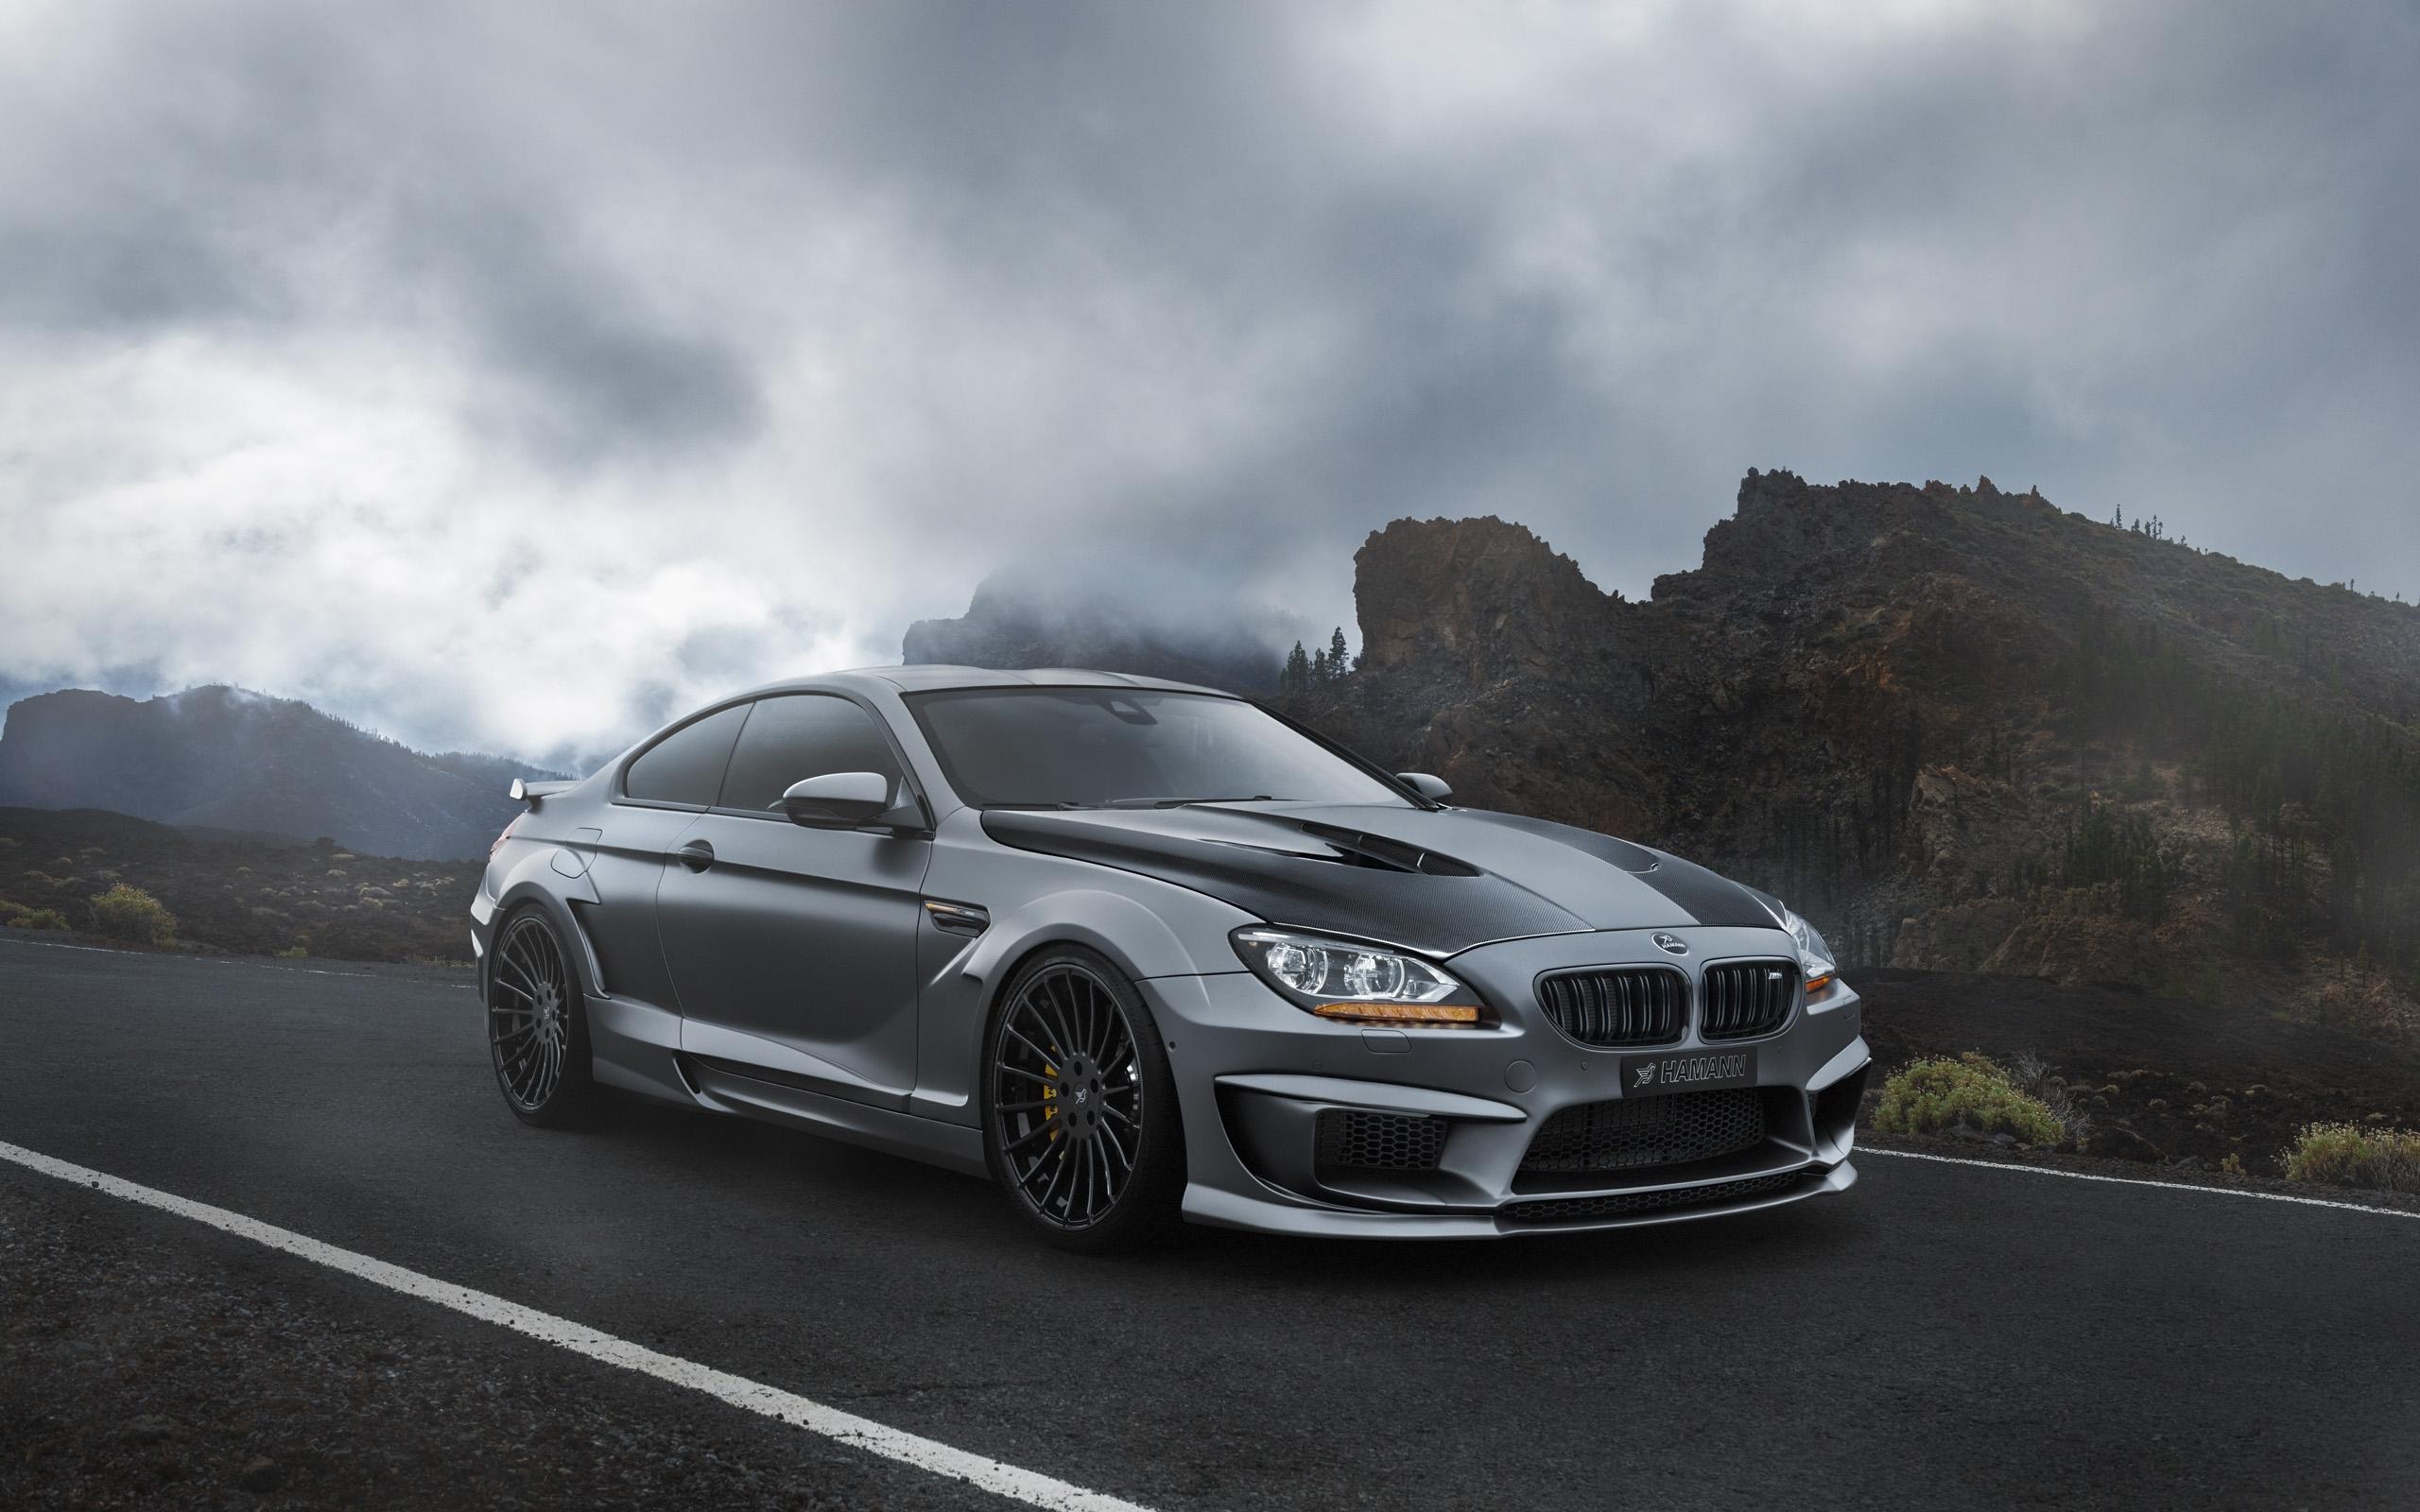 2014 Hamann BMW M6 Mirr6r Wallpaper | HD Car Wallpapers